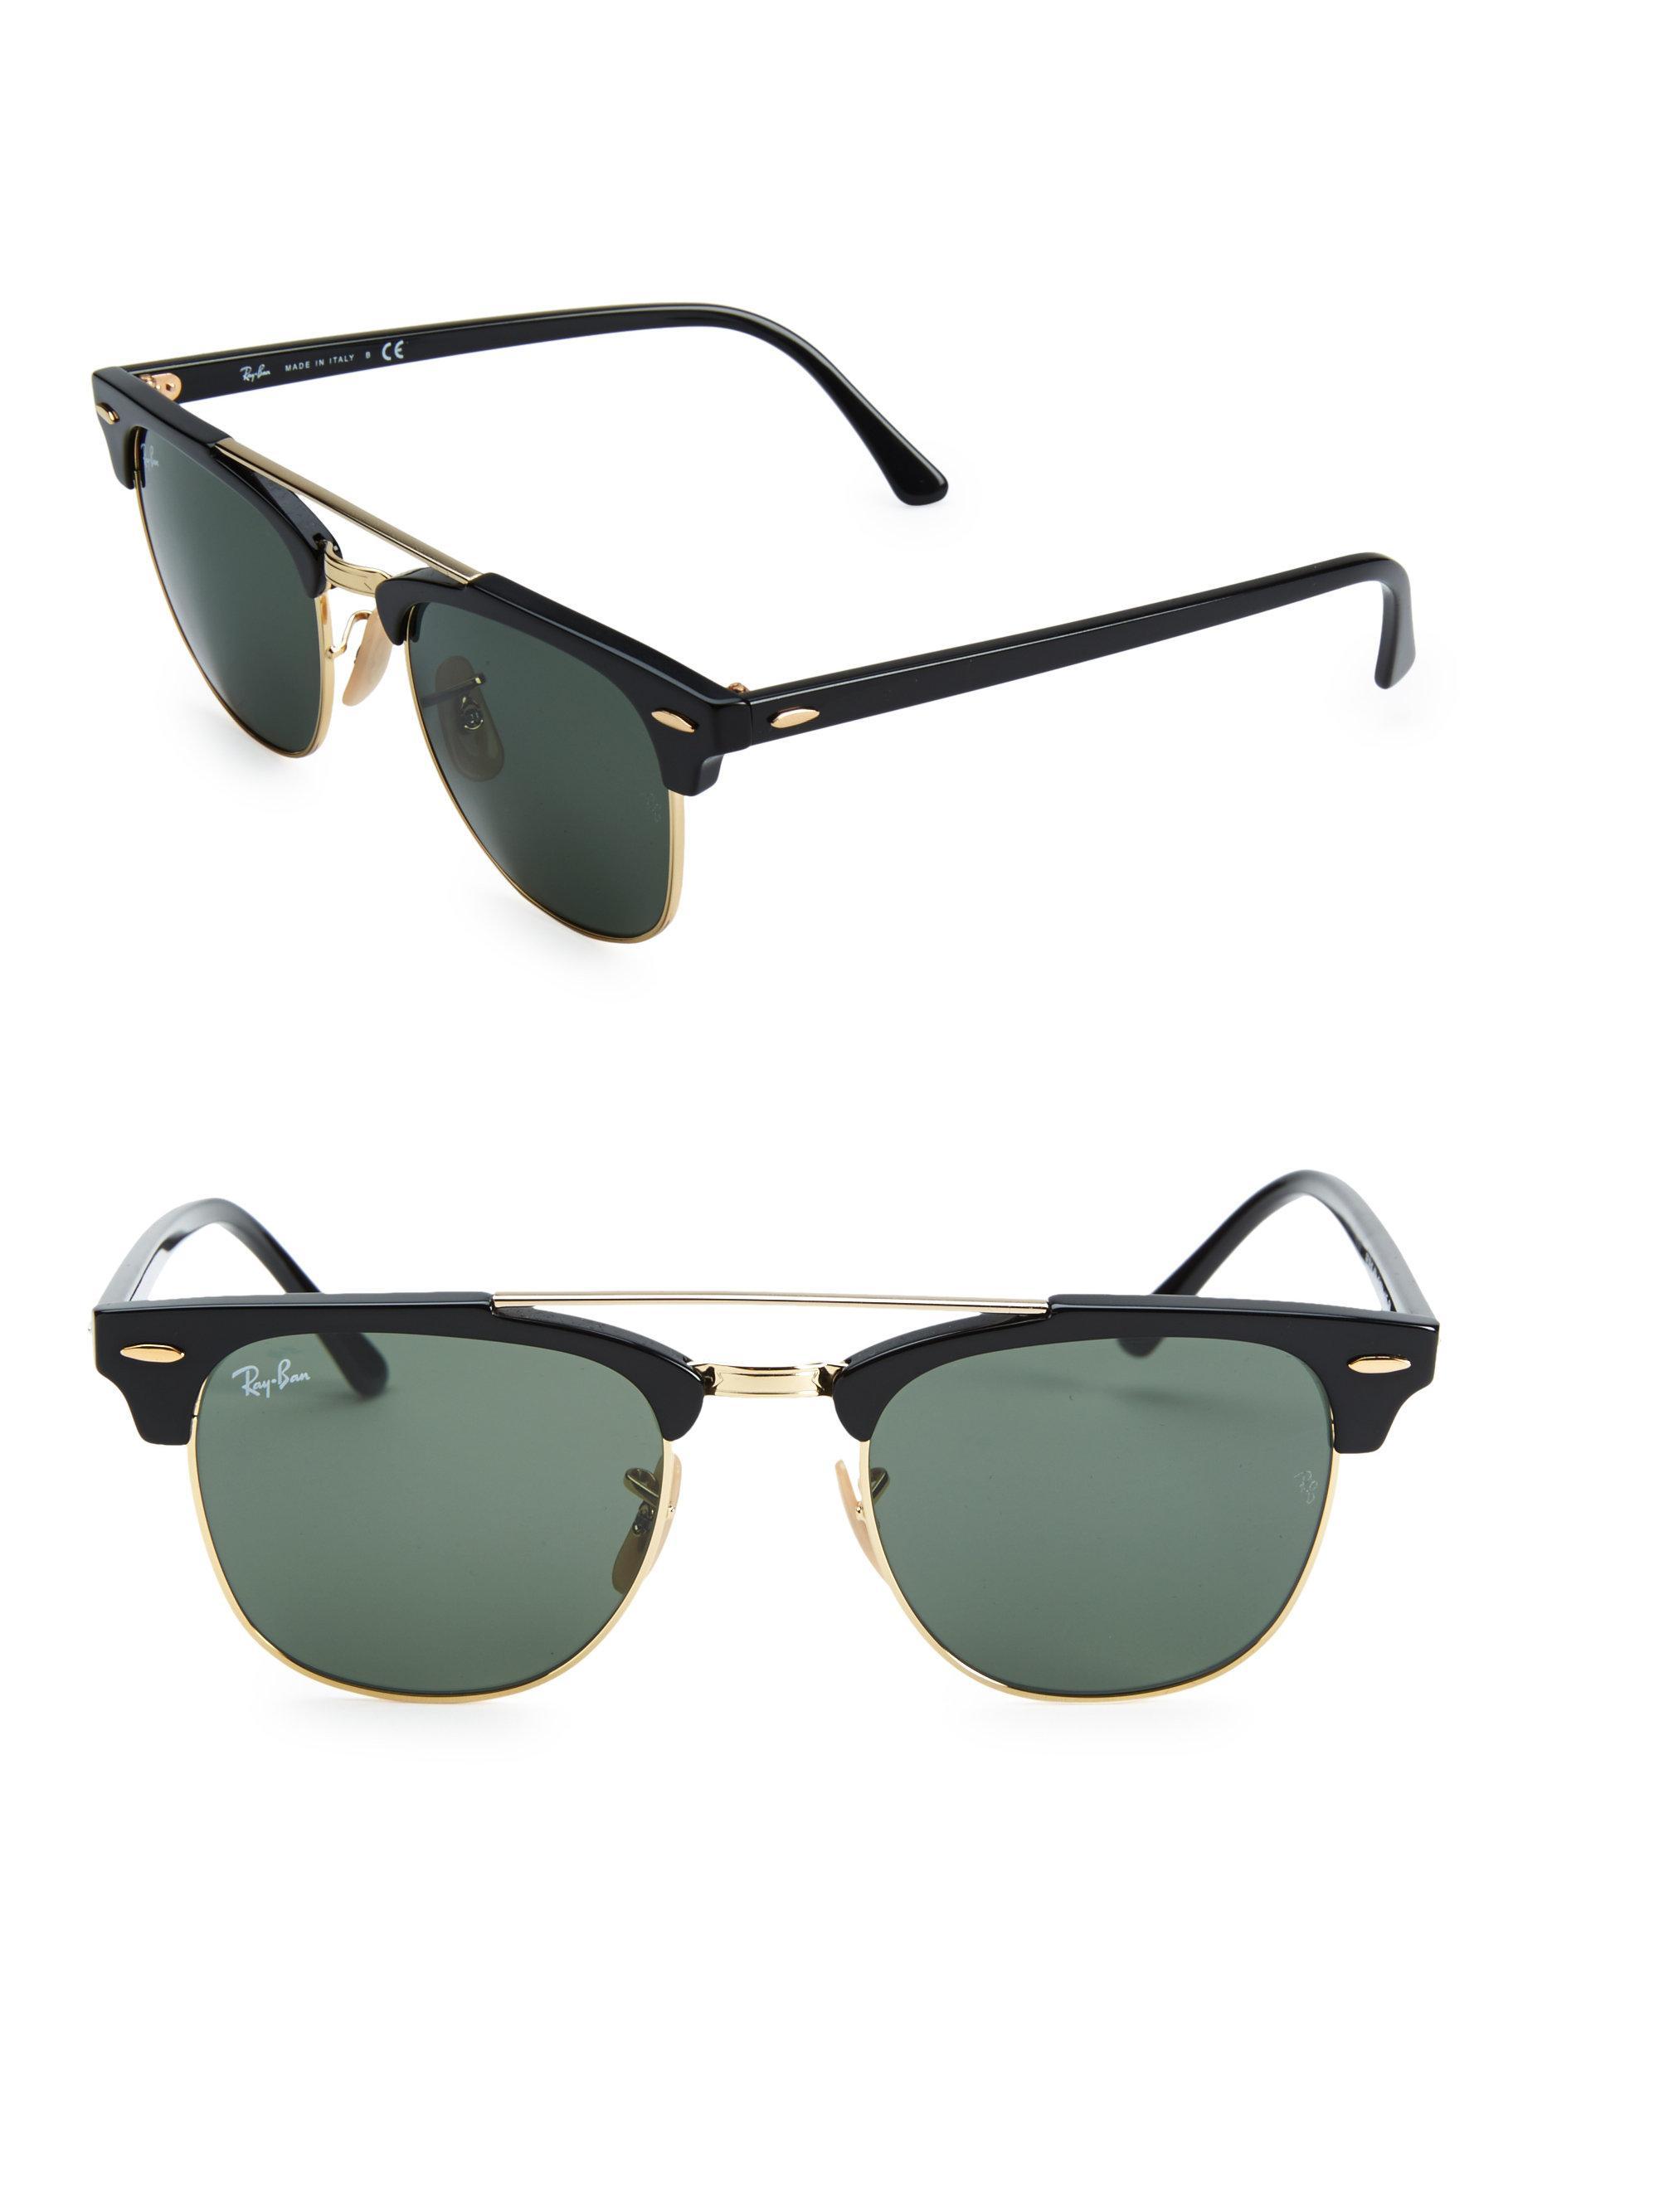 35e70d25db Lyst - Ray-Ban Clubmaster 21mm Double Bridge Sunglasses in Black for Men